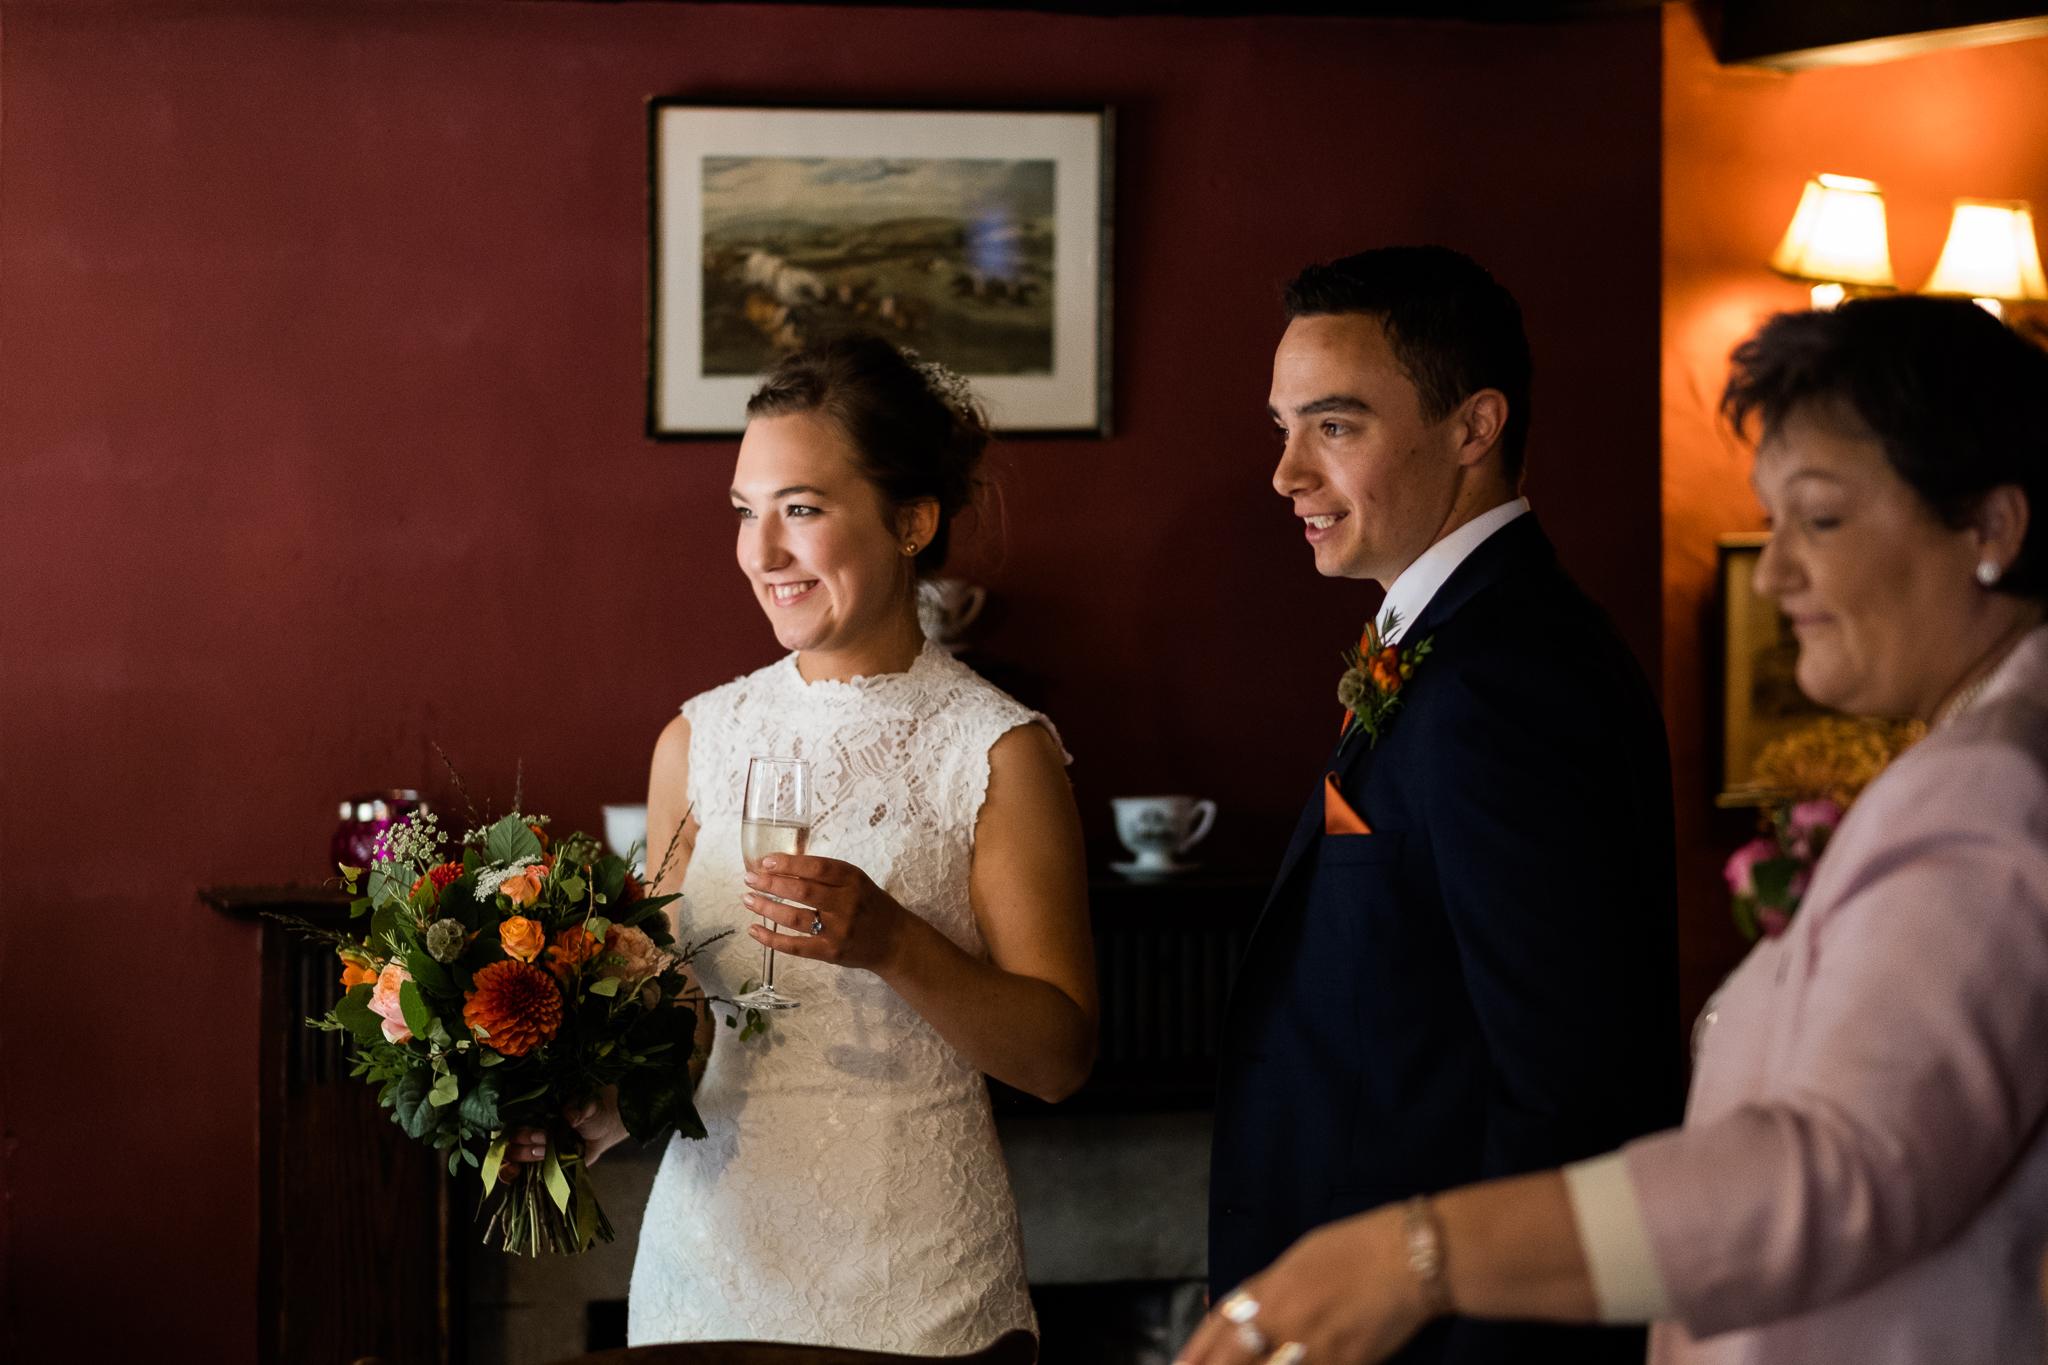 Relaxed Documentary Wedding Photography at The Wizard Inn, Alderley Edge Cheshire - Jenny Harper-40.jpg